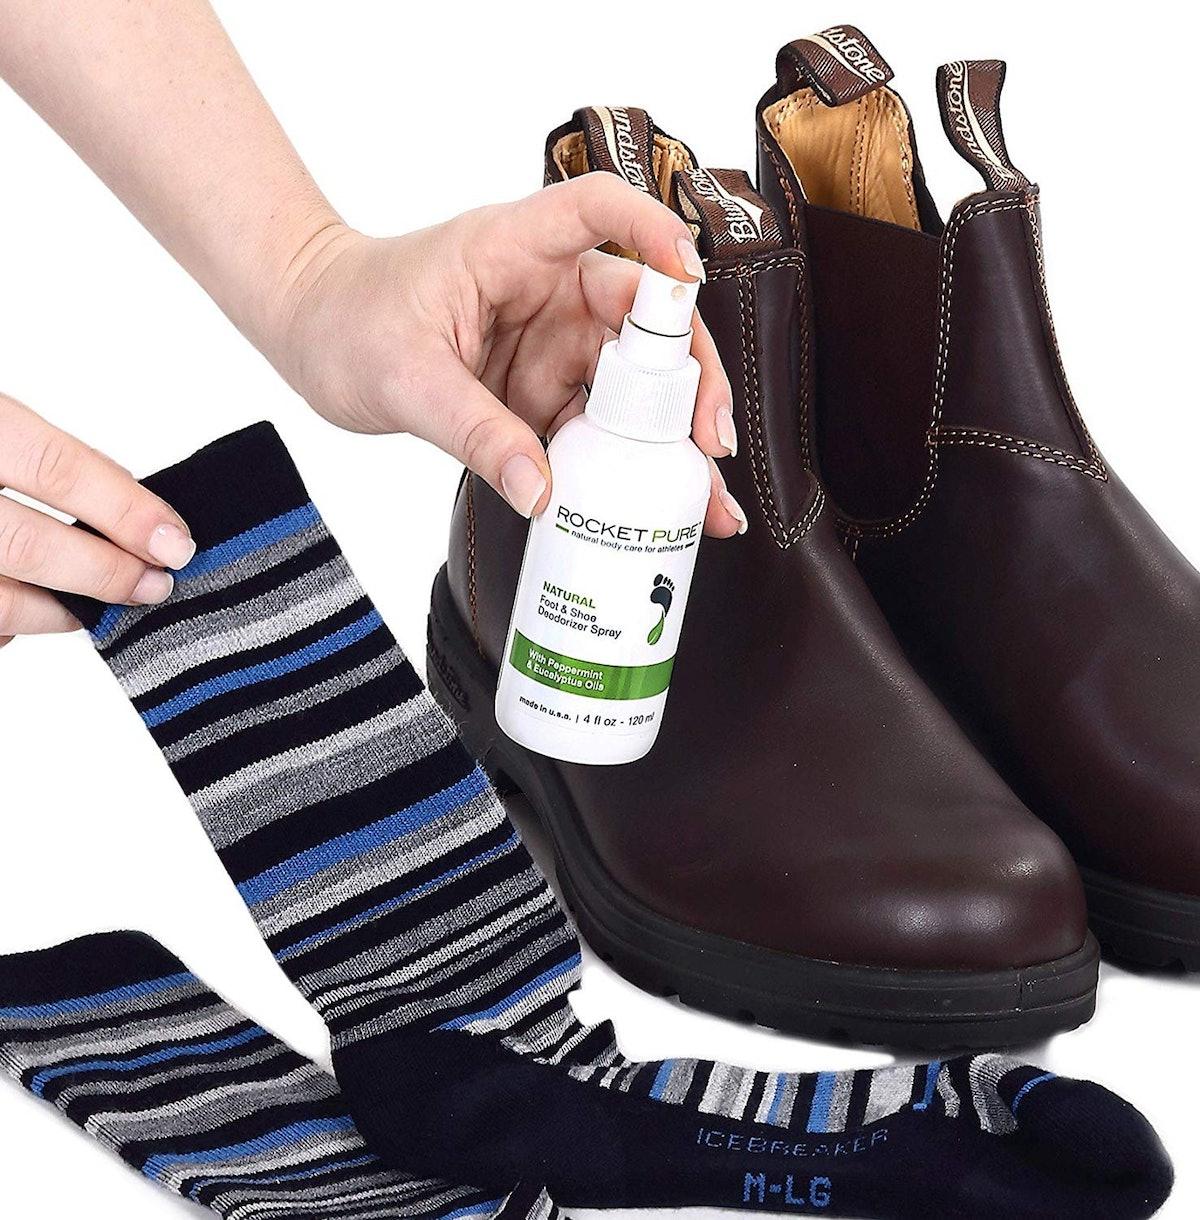 Rocket Pure Natural Mint Shoe Deodorizer